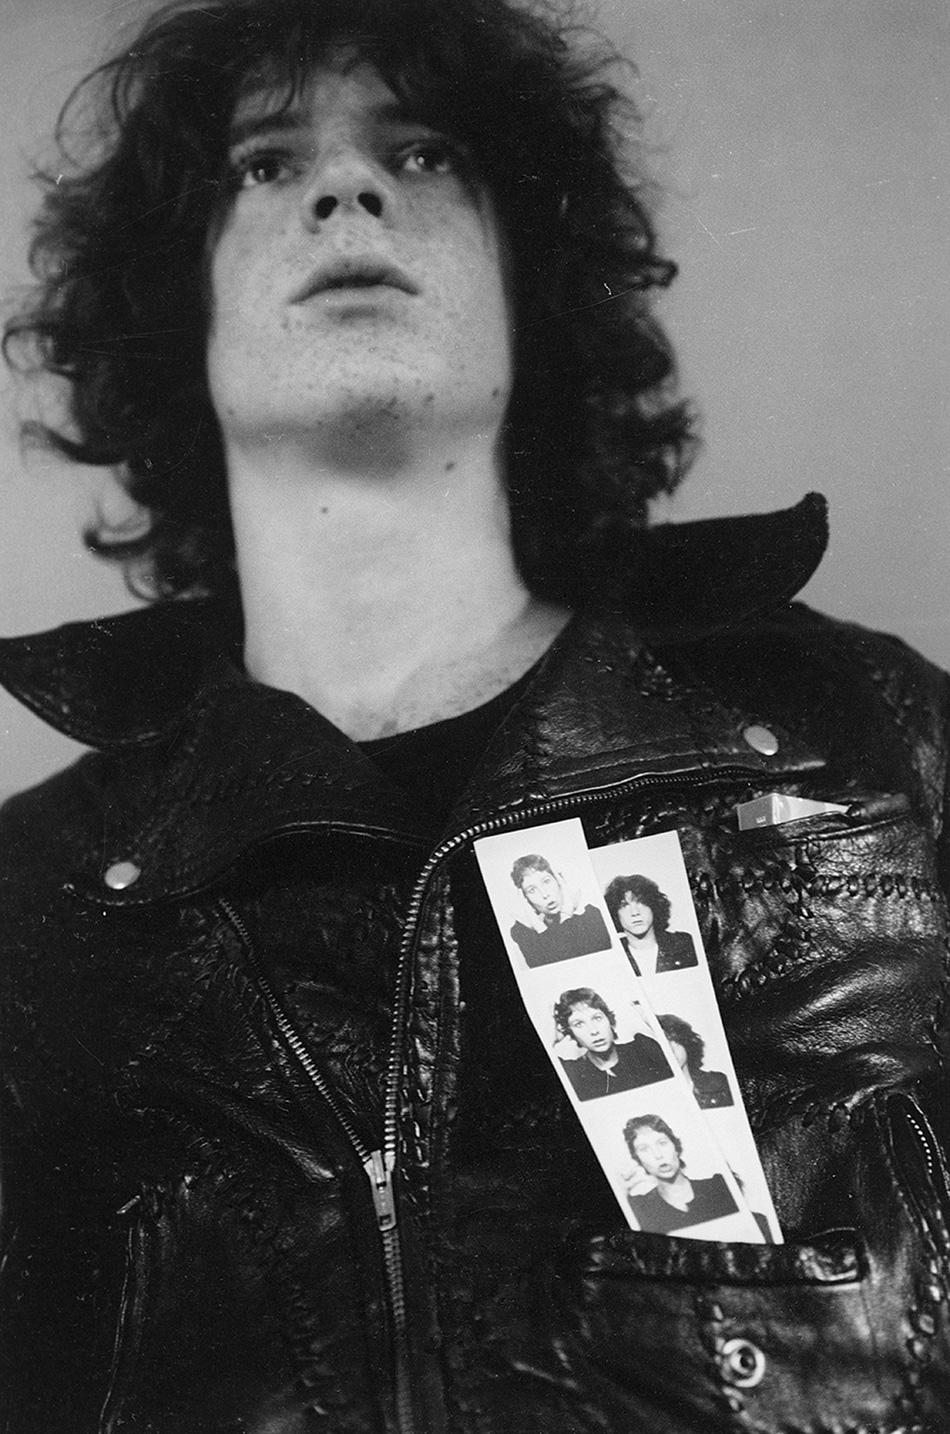 Richard-Young-John-Paul-Getty-III-Innsbruck-1974